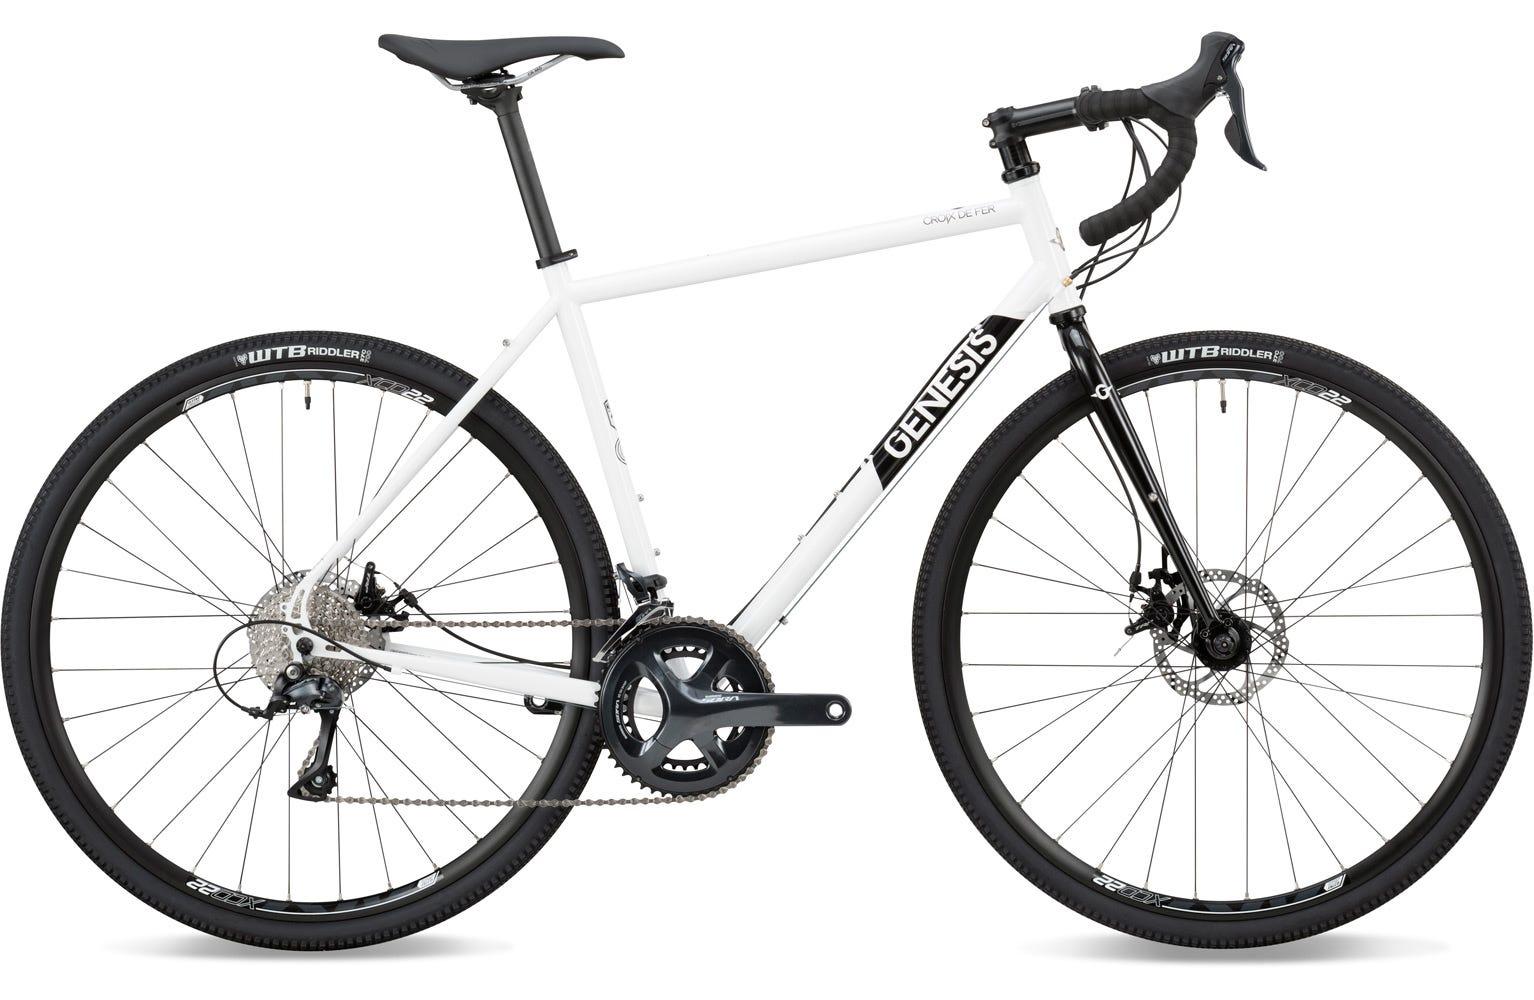 Genesis 2020 Croix De Fer 10 Md Ex Display Bike